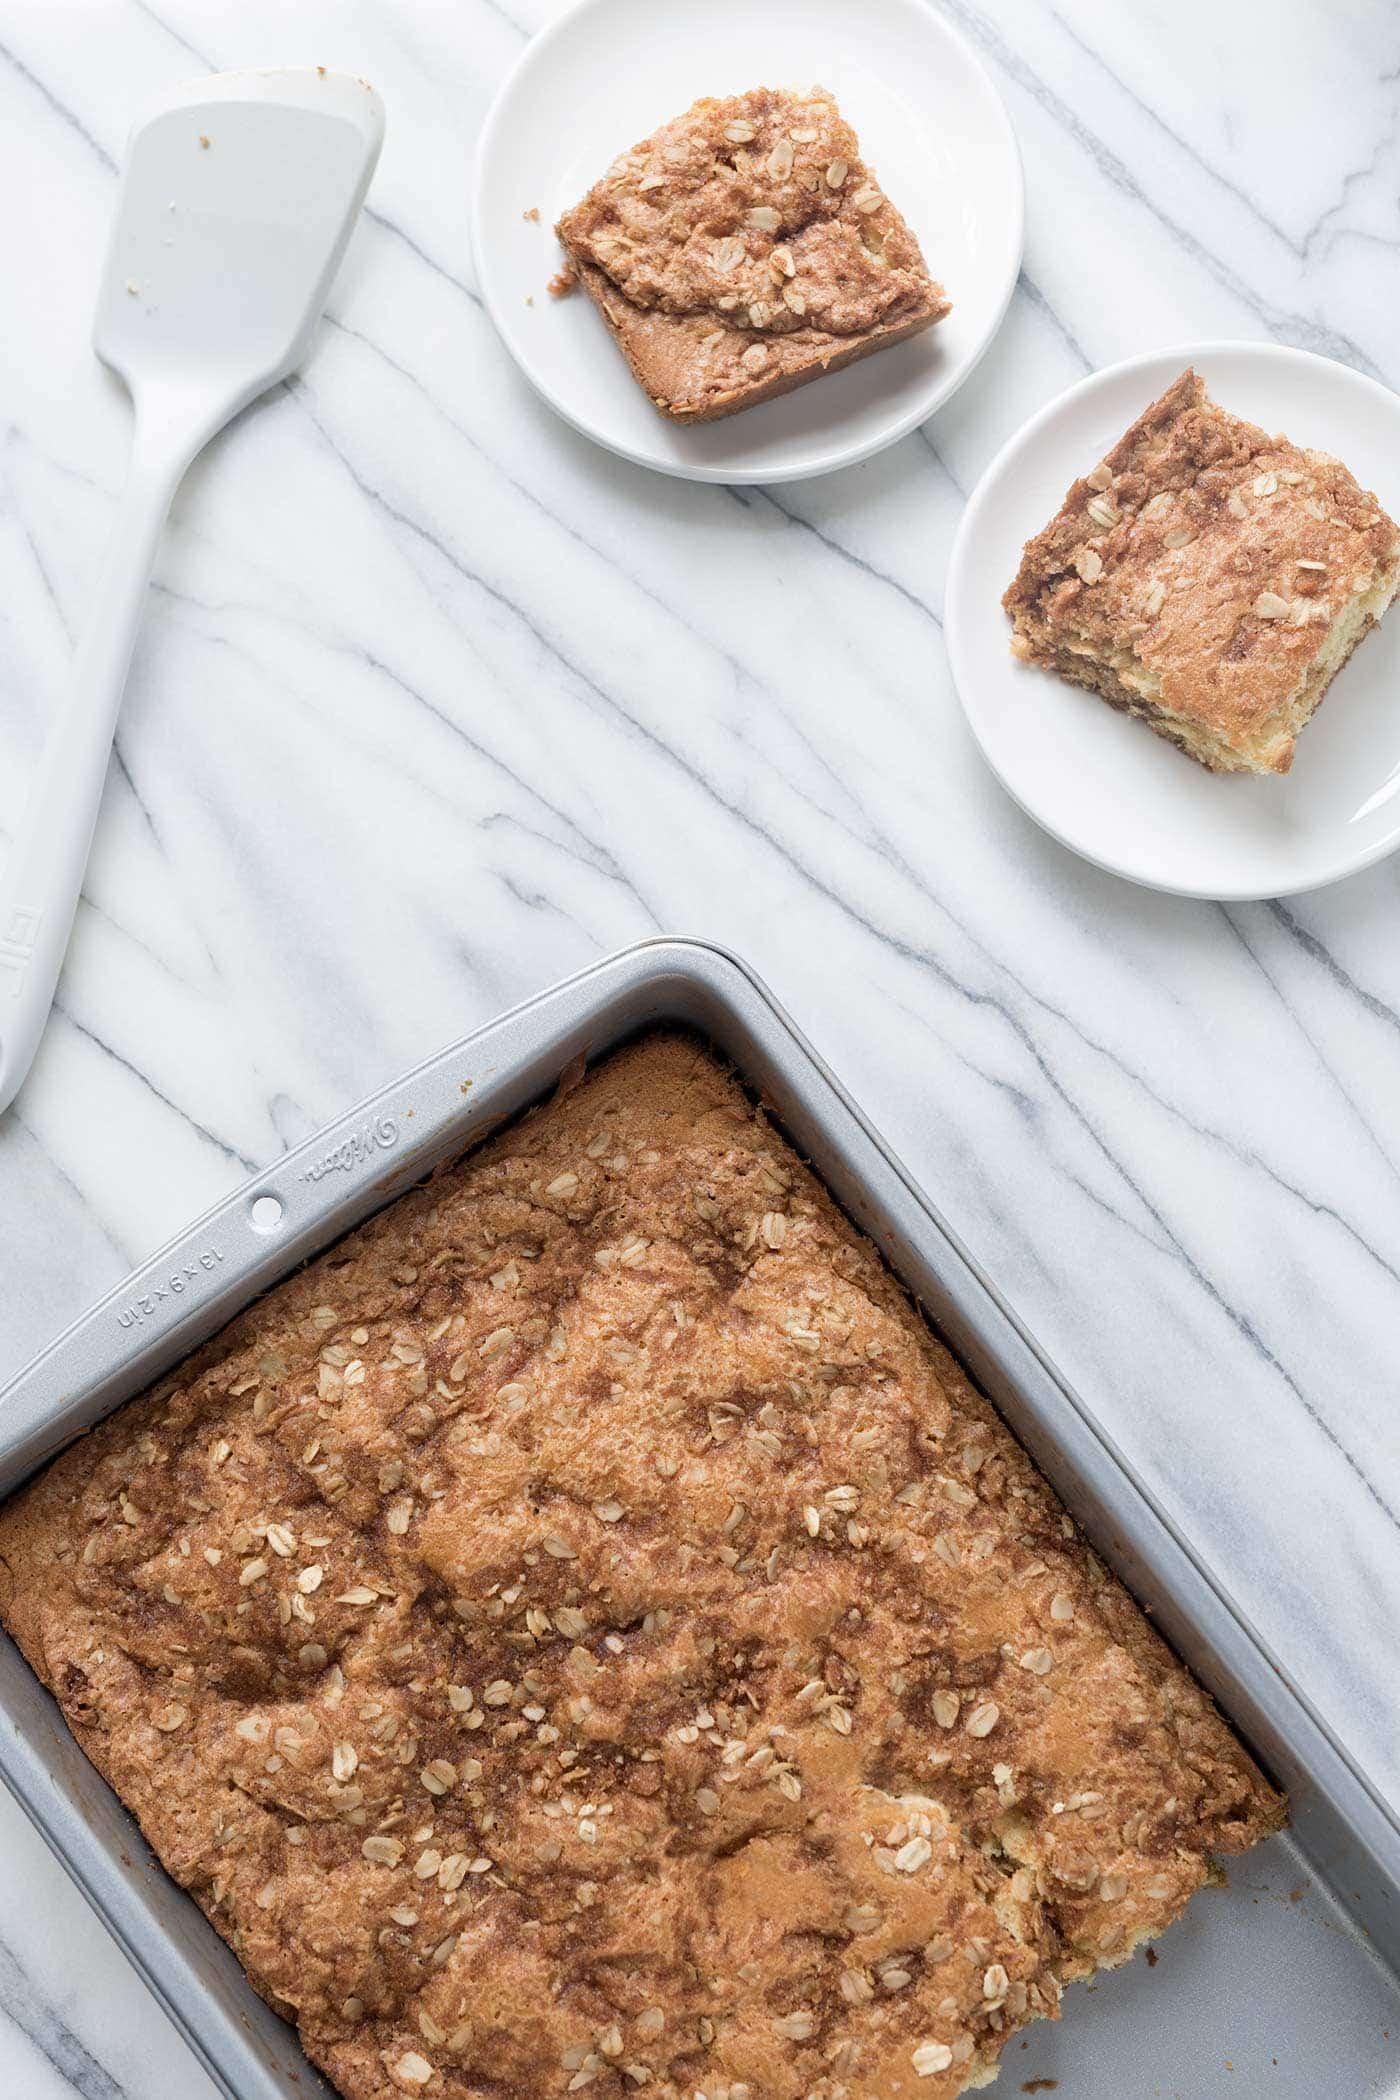 A photo of prepared sour cream coffee cake plus two slices.